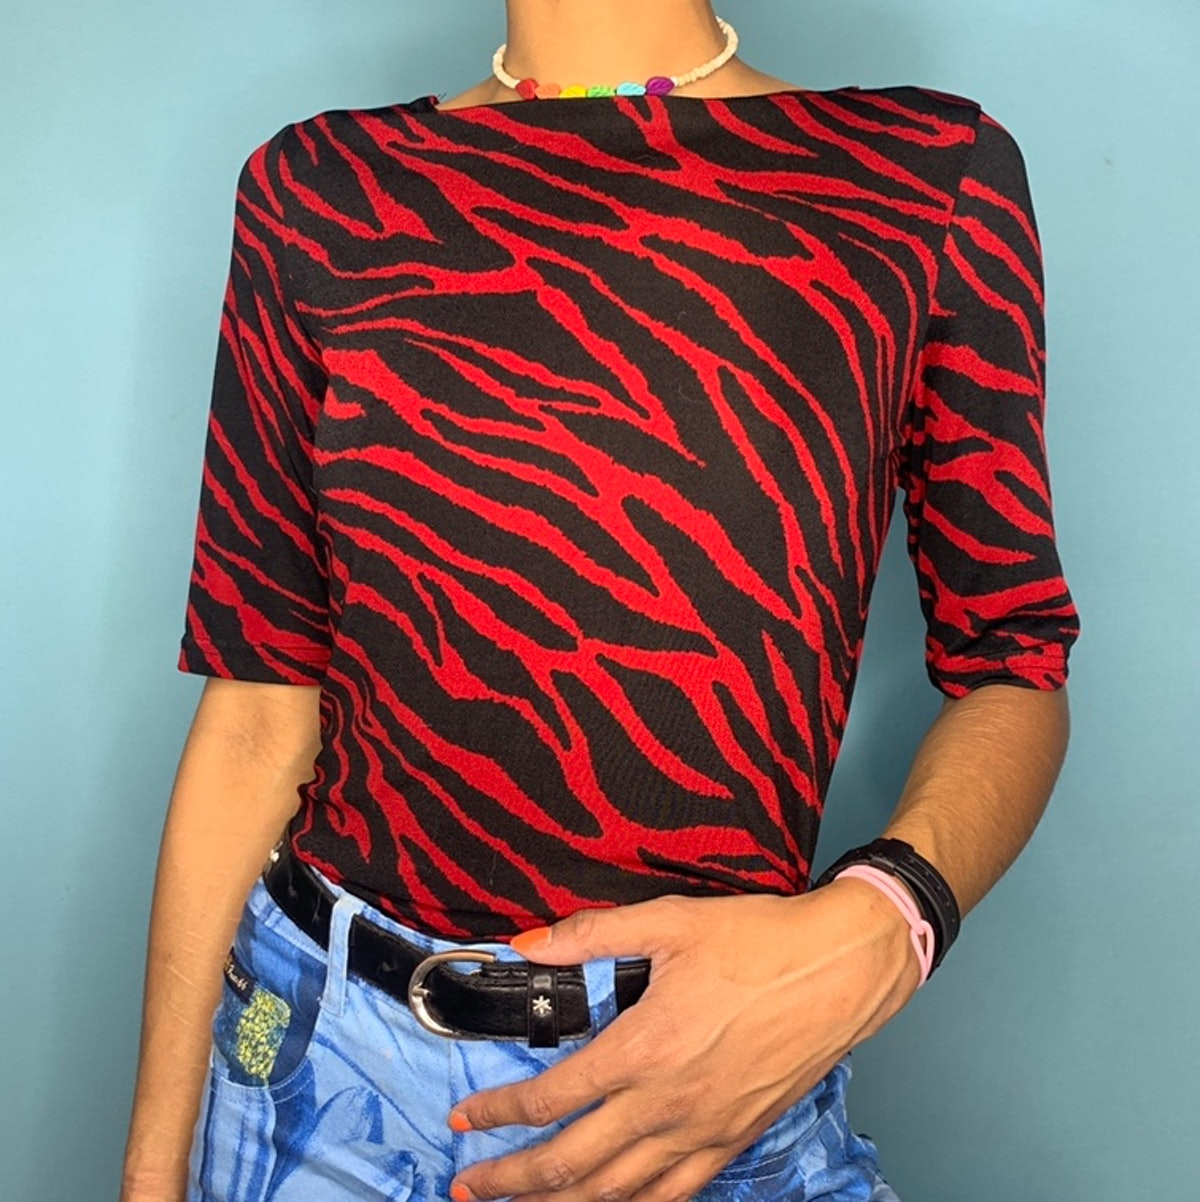 @mothcloudz Red Zebra Tee